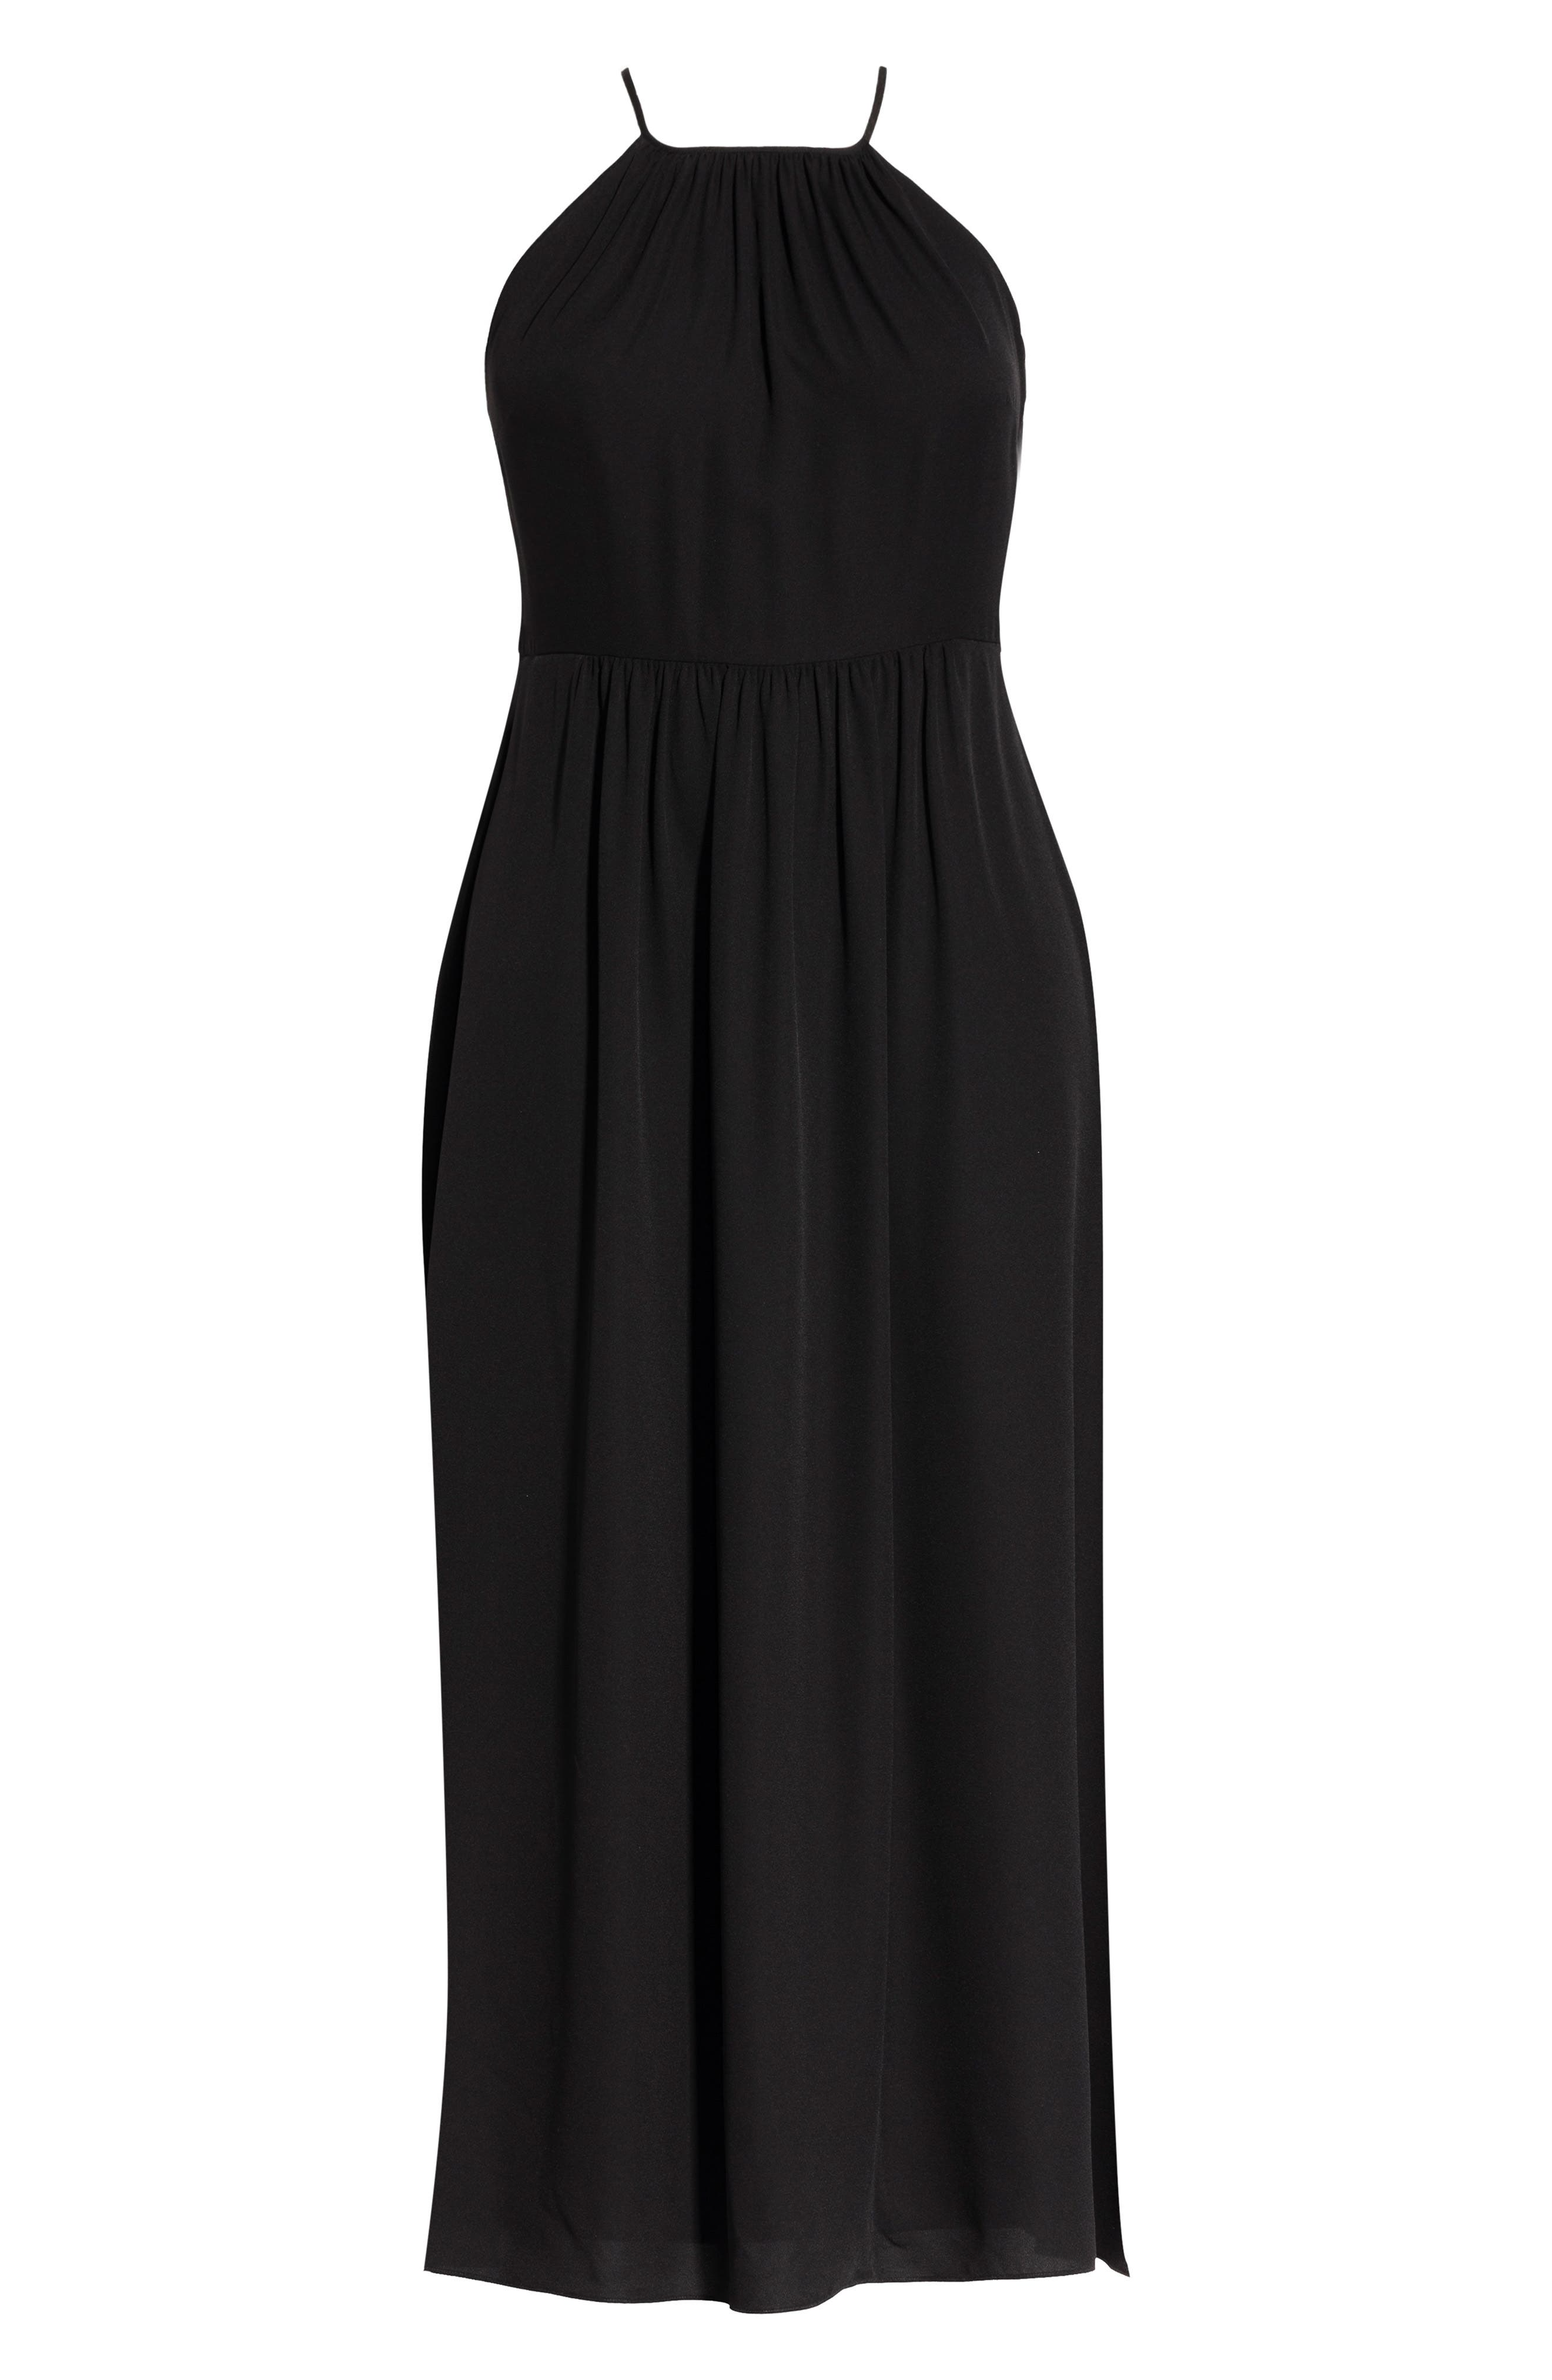 Devotion Maxi Dress,                             Alternate thumbnail 3, color,                             BLACK